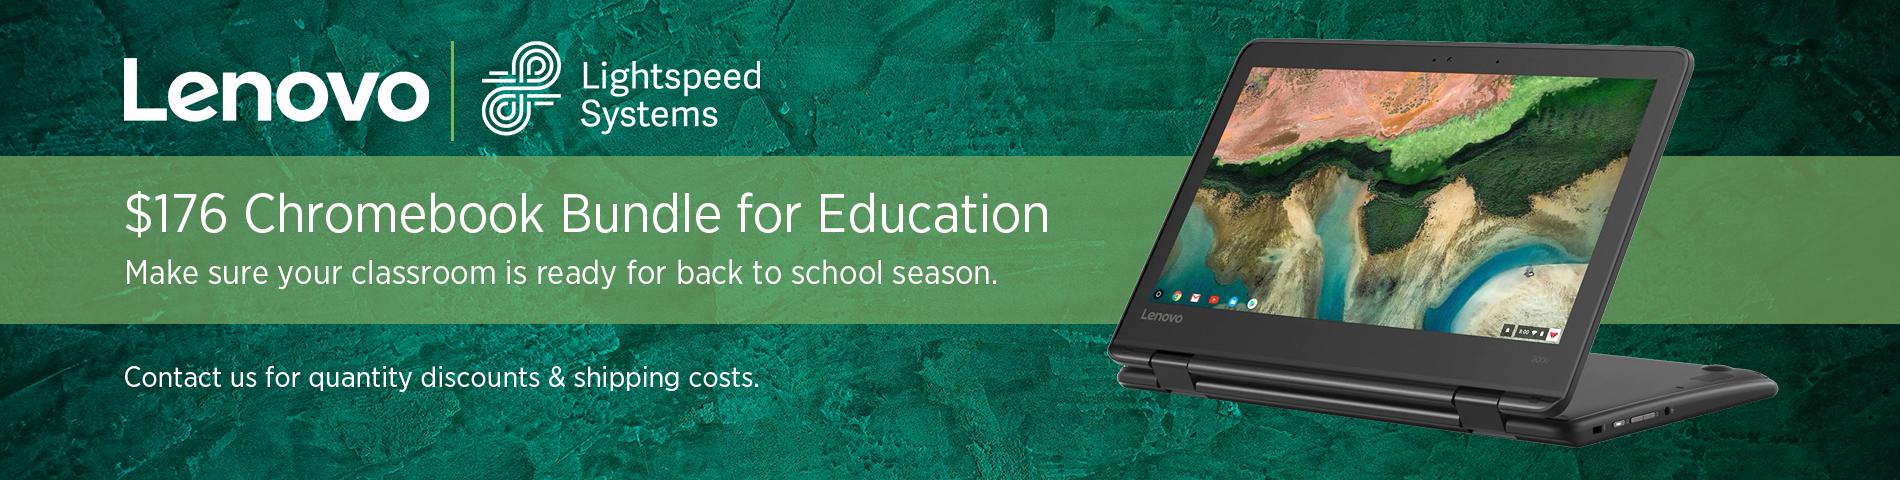 Chromebook Bundle for Education